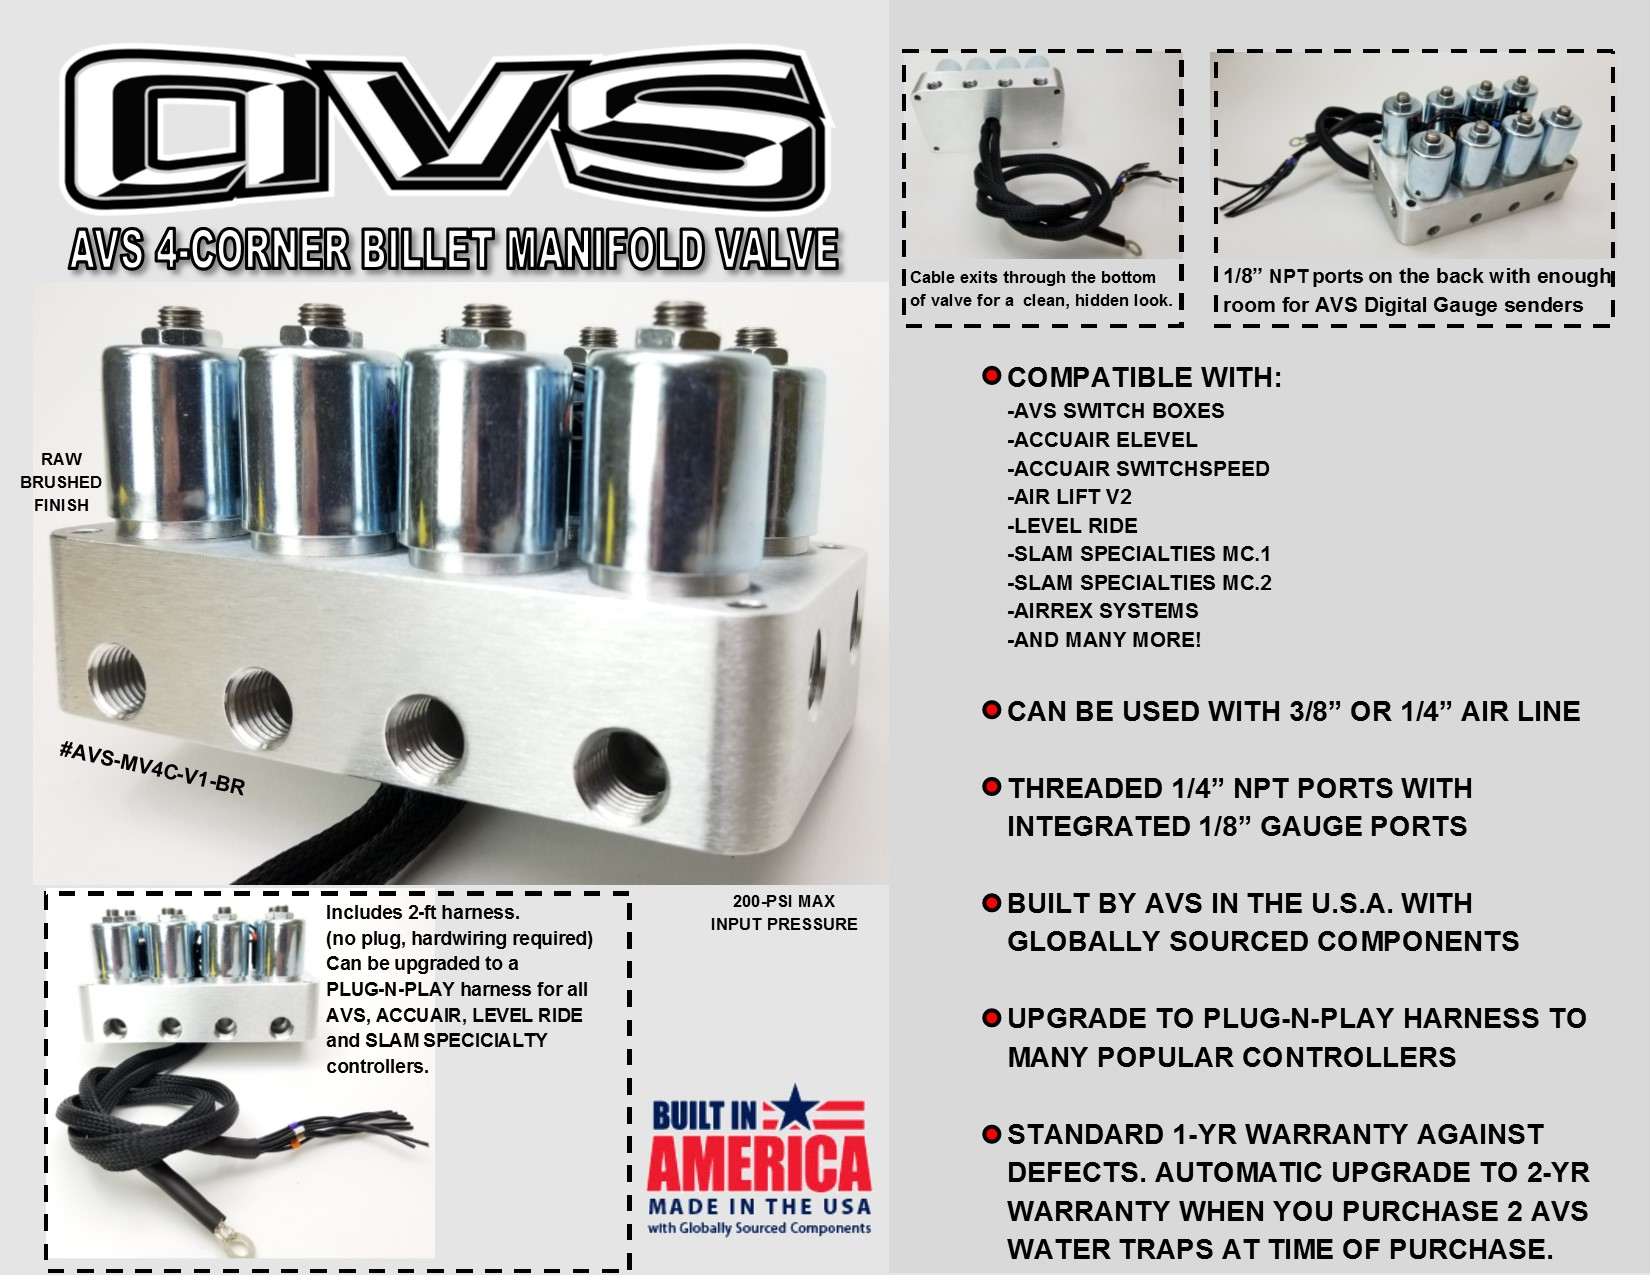 avs-mv4c-v1-br-release.jpg